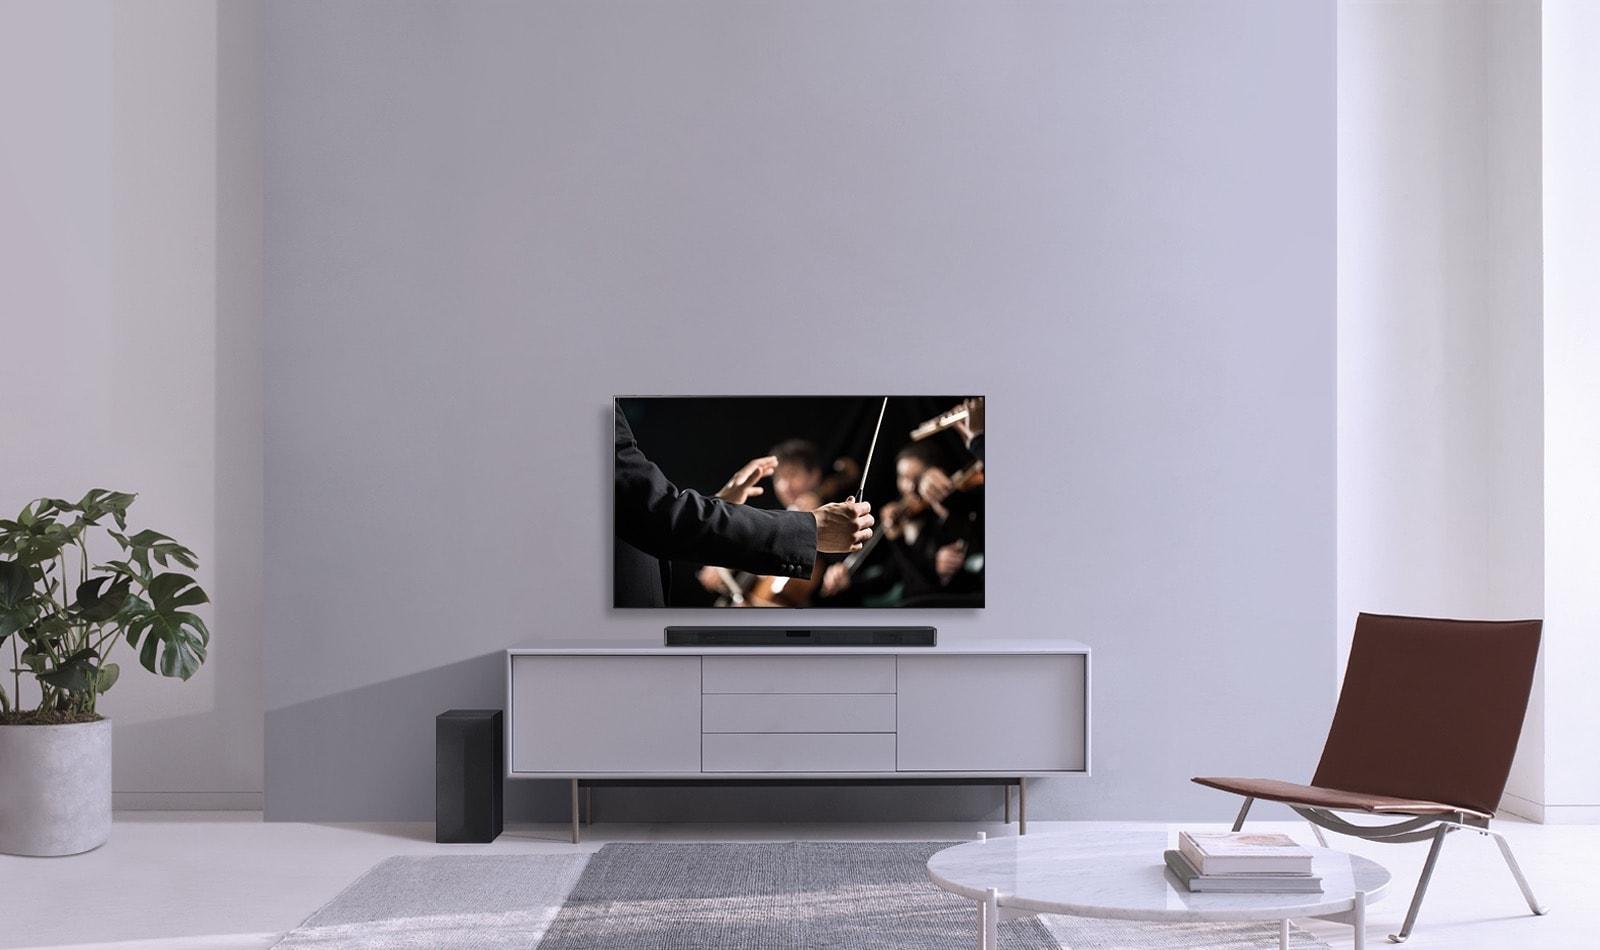 CAV-SoundBar-SL4-06-TV-Sound-Sync-Desktop